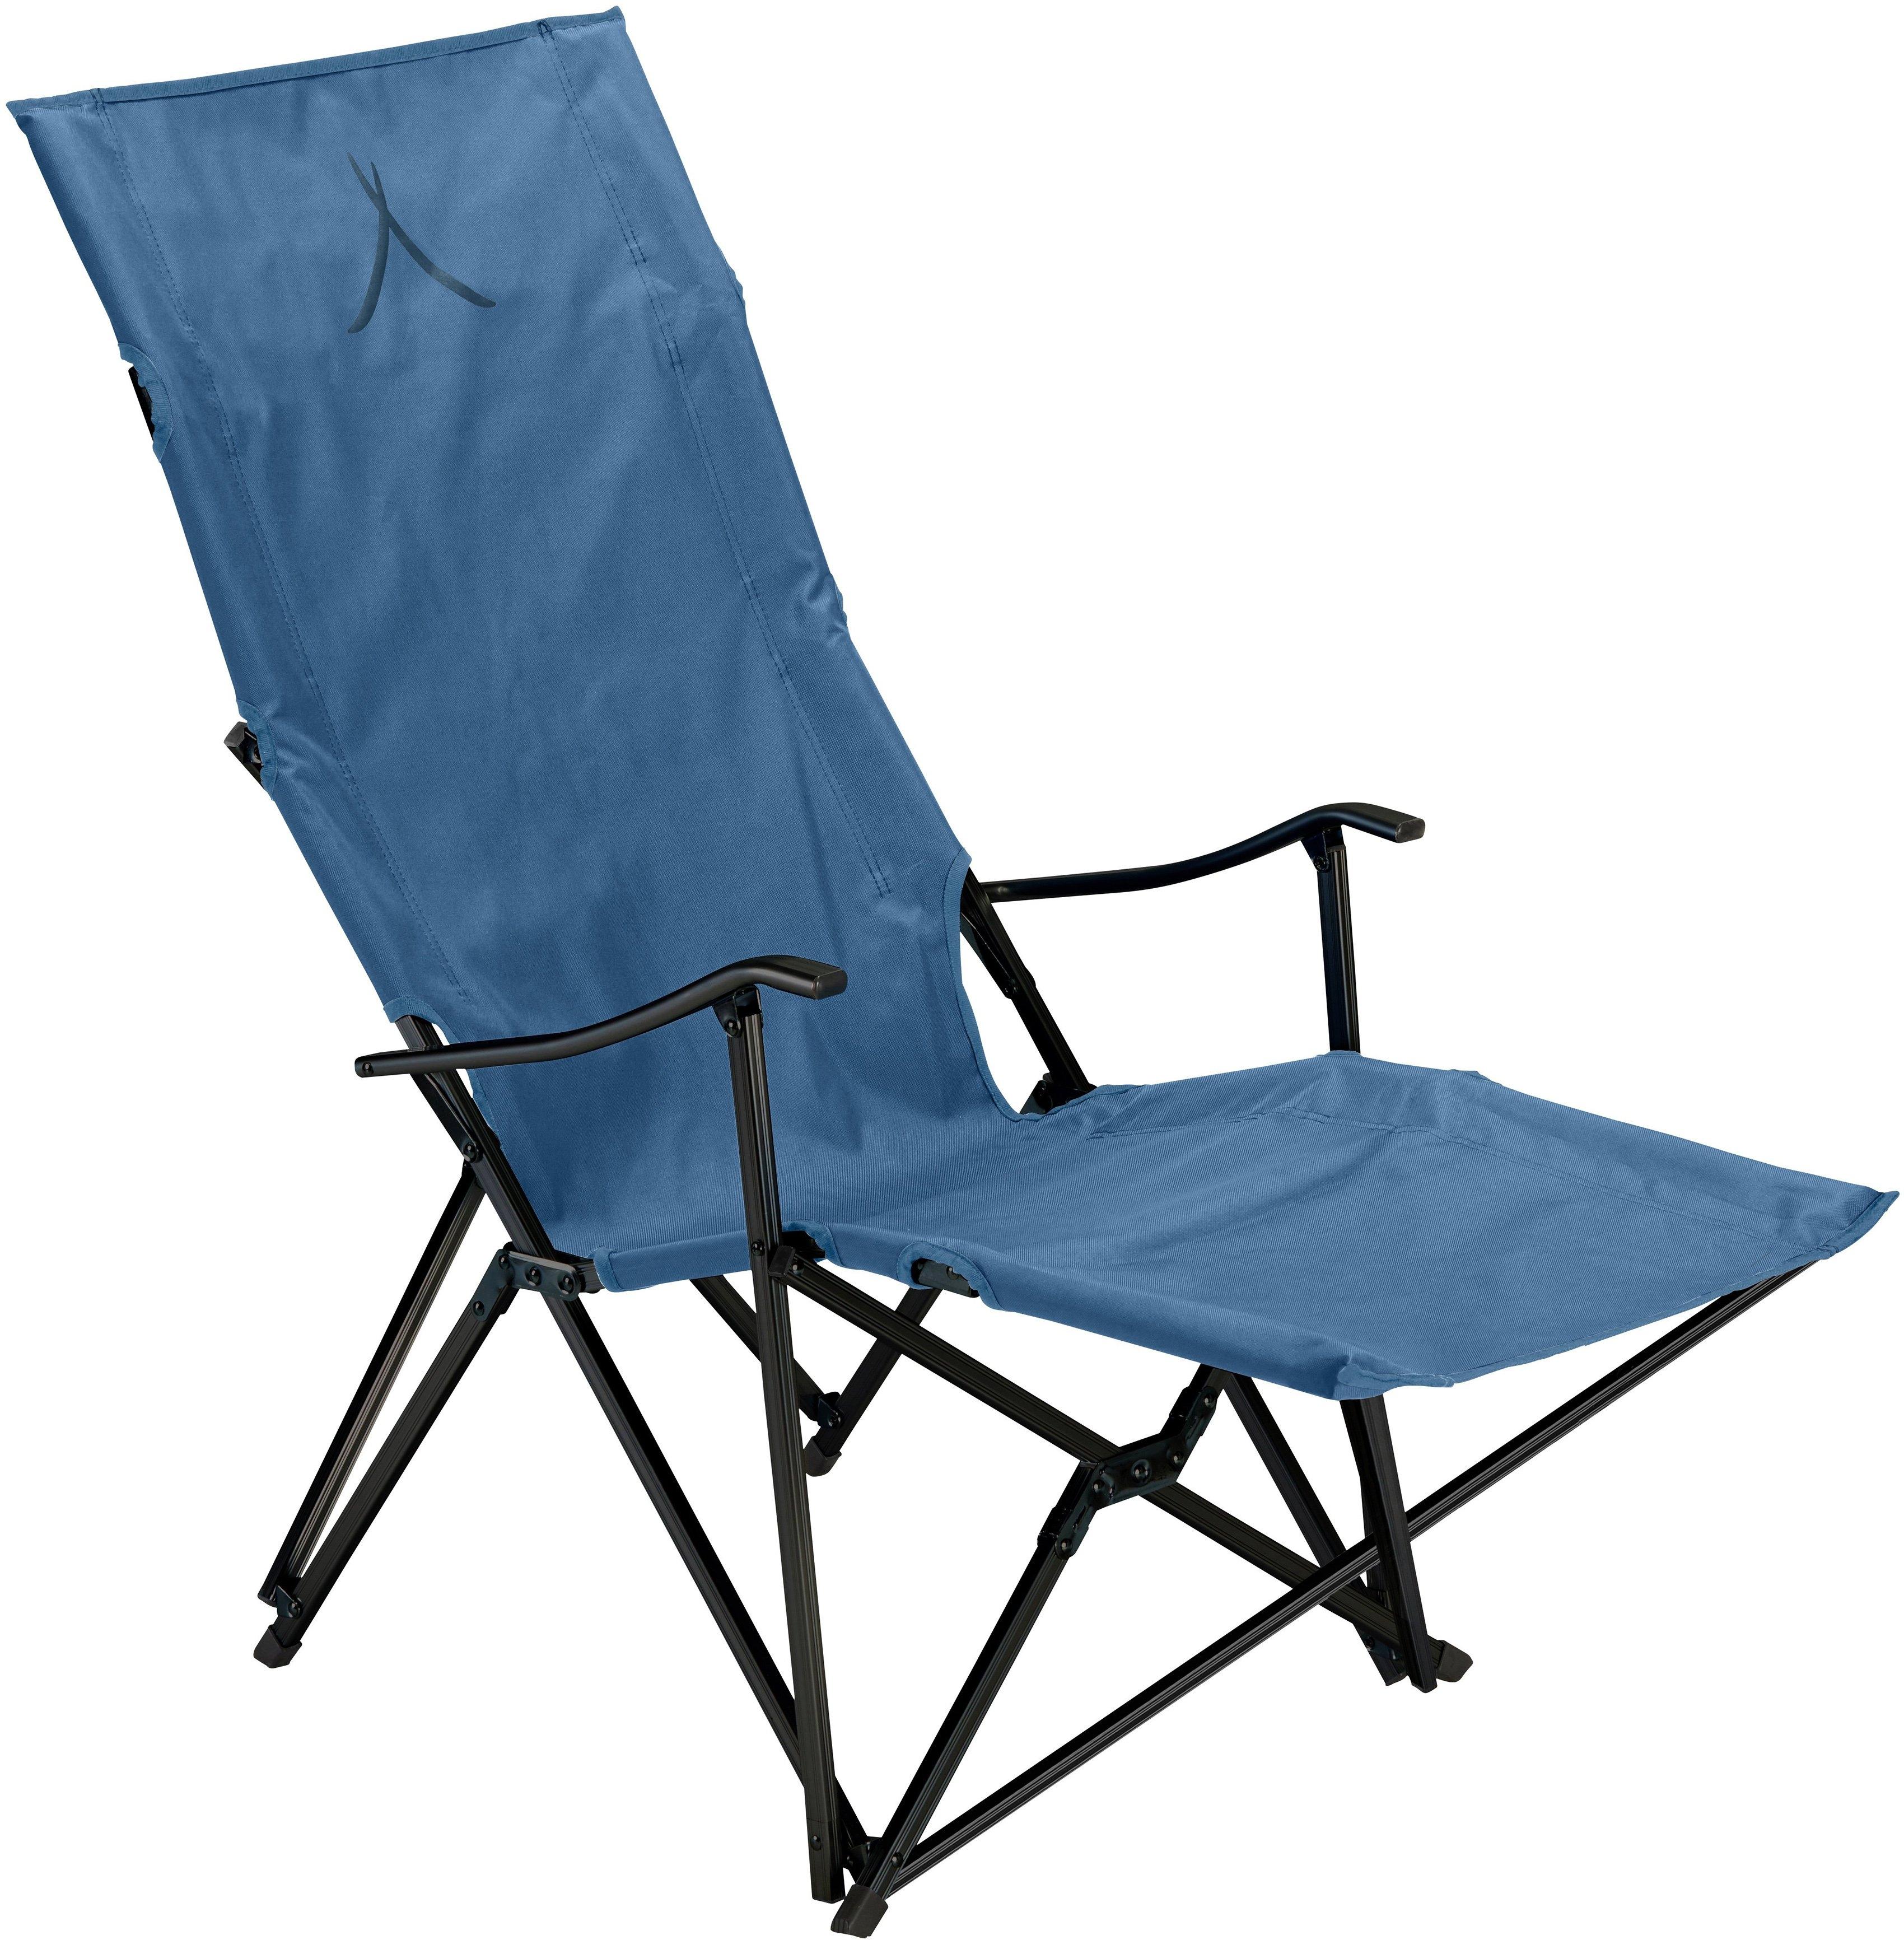 GRAND CANYON campingstoel EL TOVAR LOUNGER (1 stuk) online kopen op otto.nl